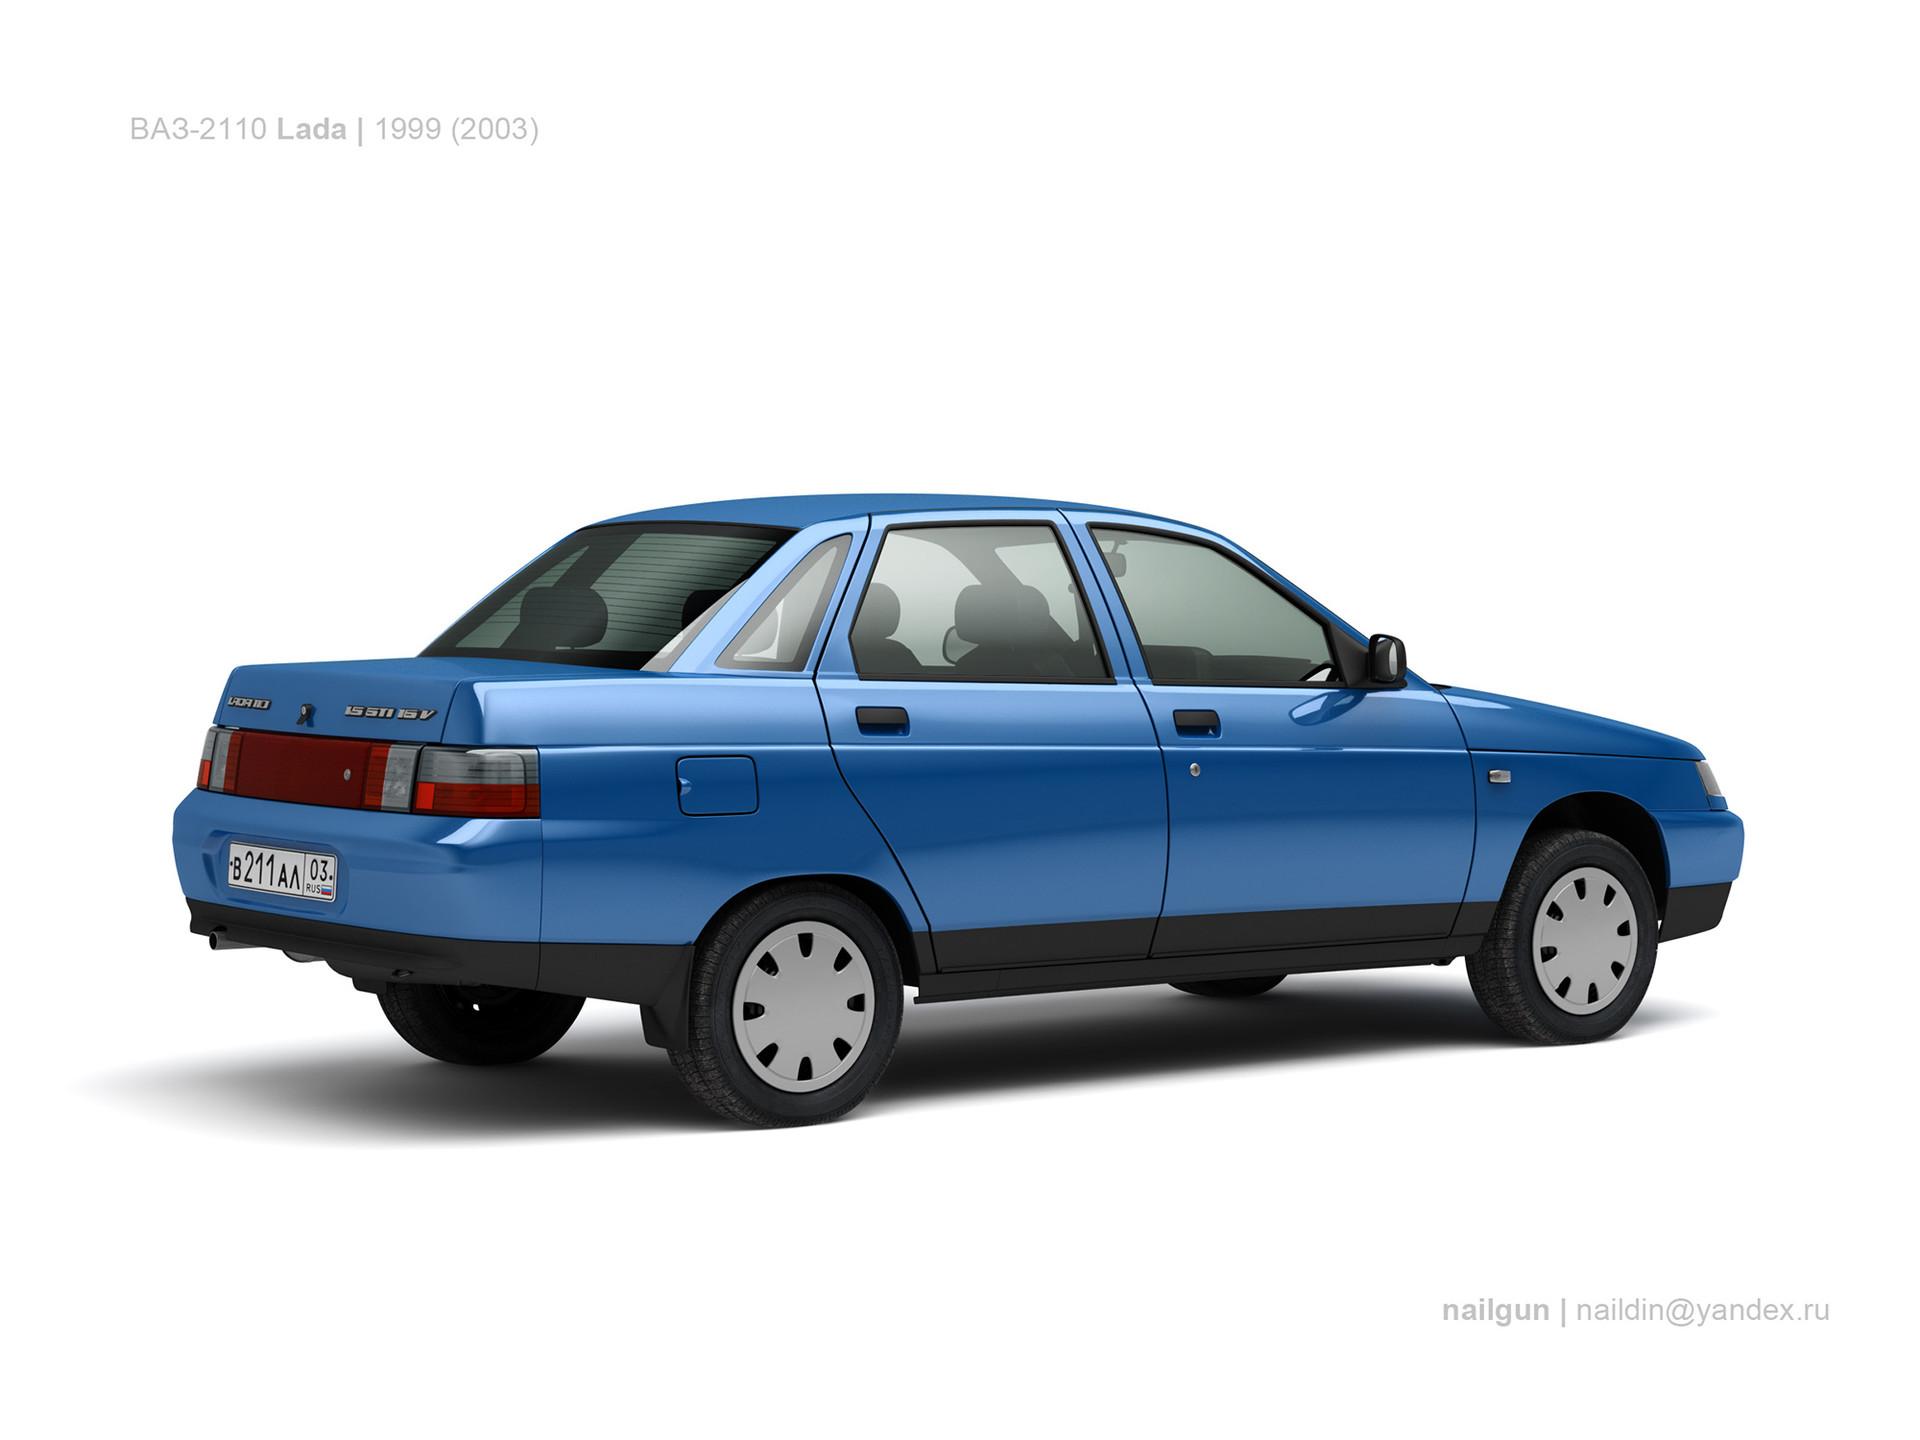 Nail khusnutdinov ussr vaz russia vaz 2110 lada 1999 1